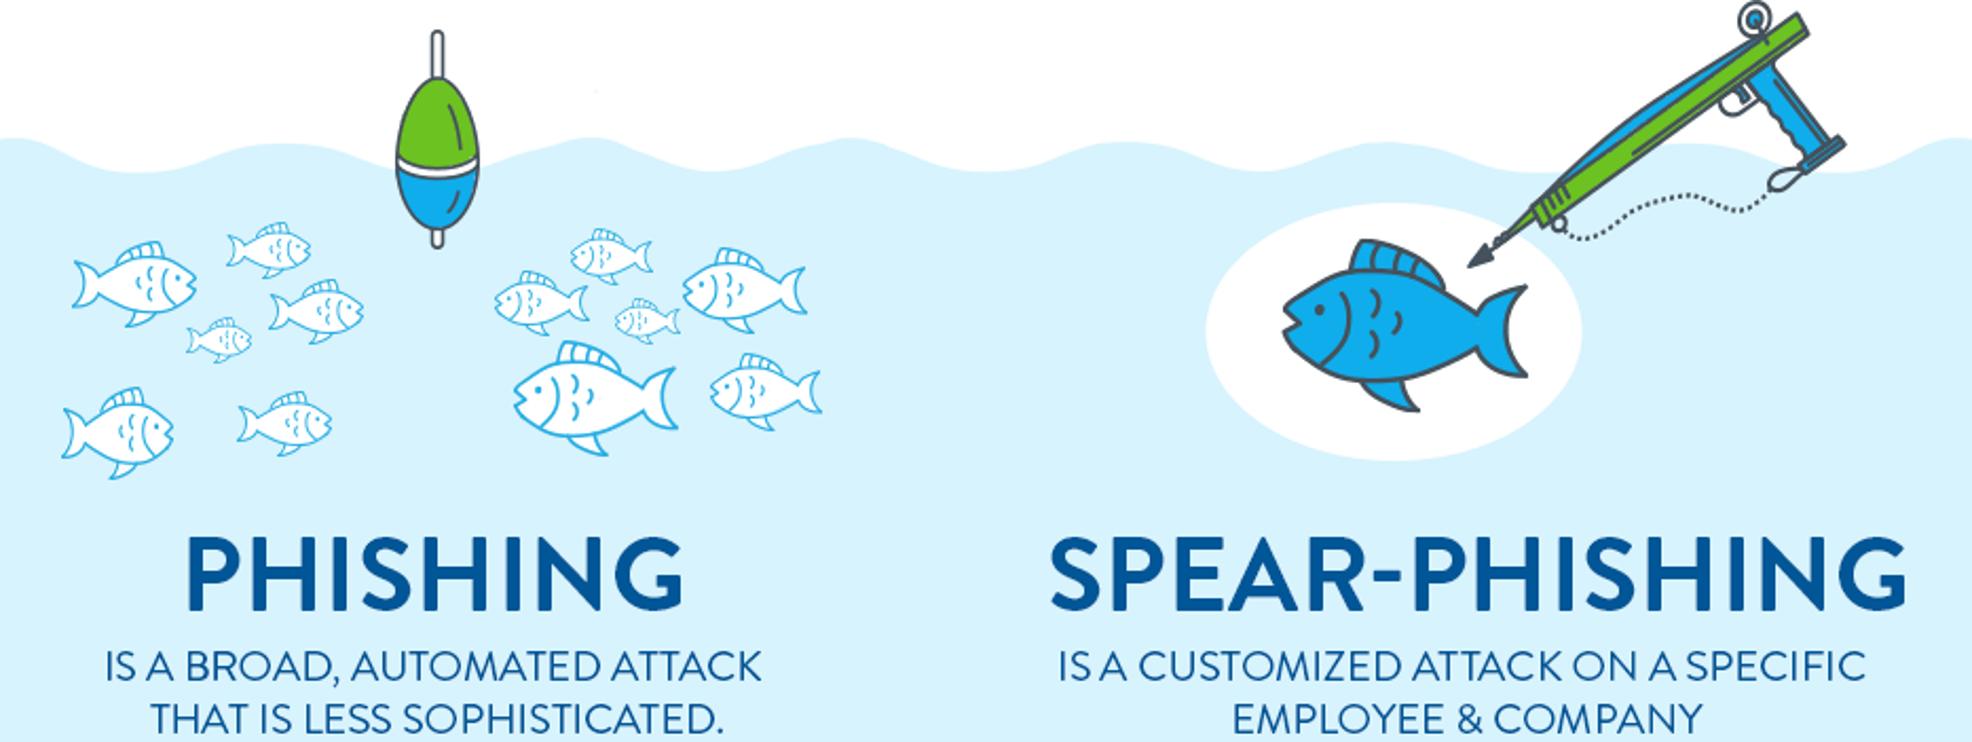 phishing-vs-spear-phishing